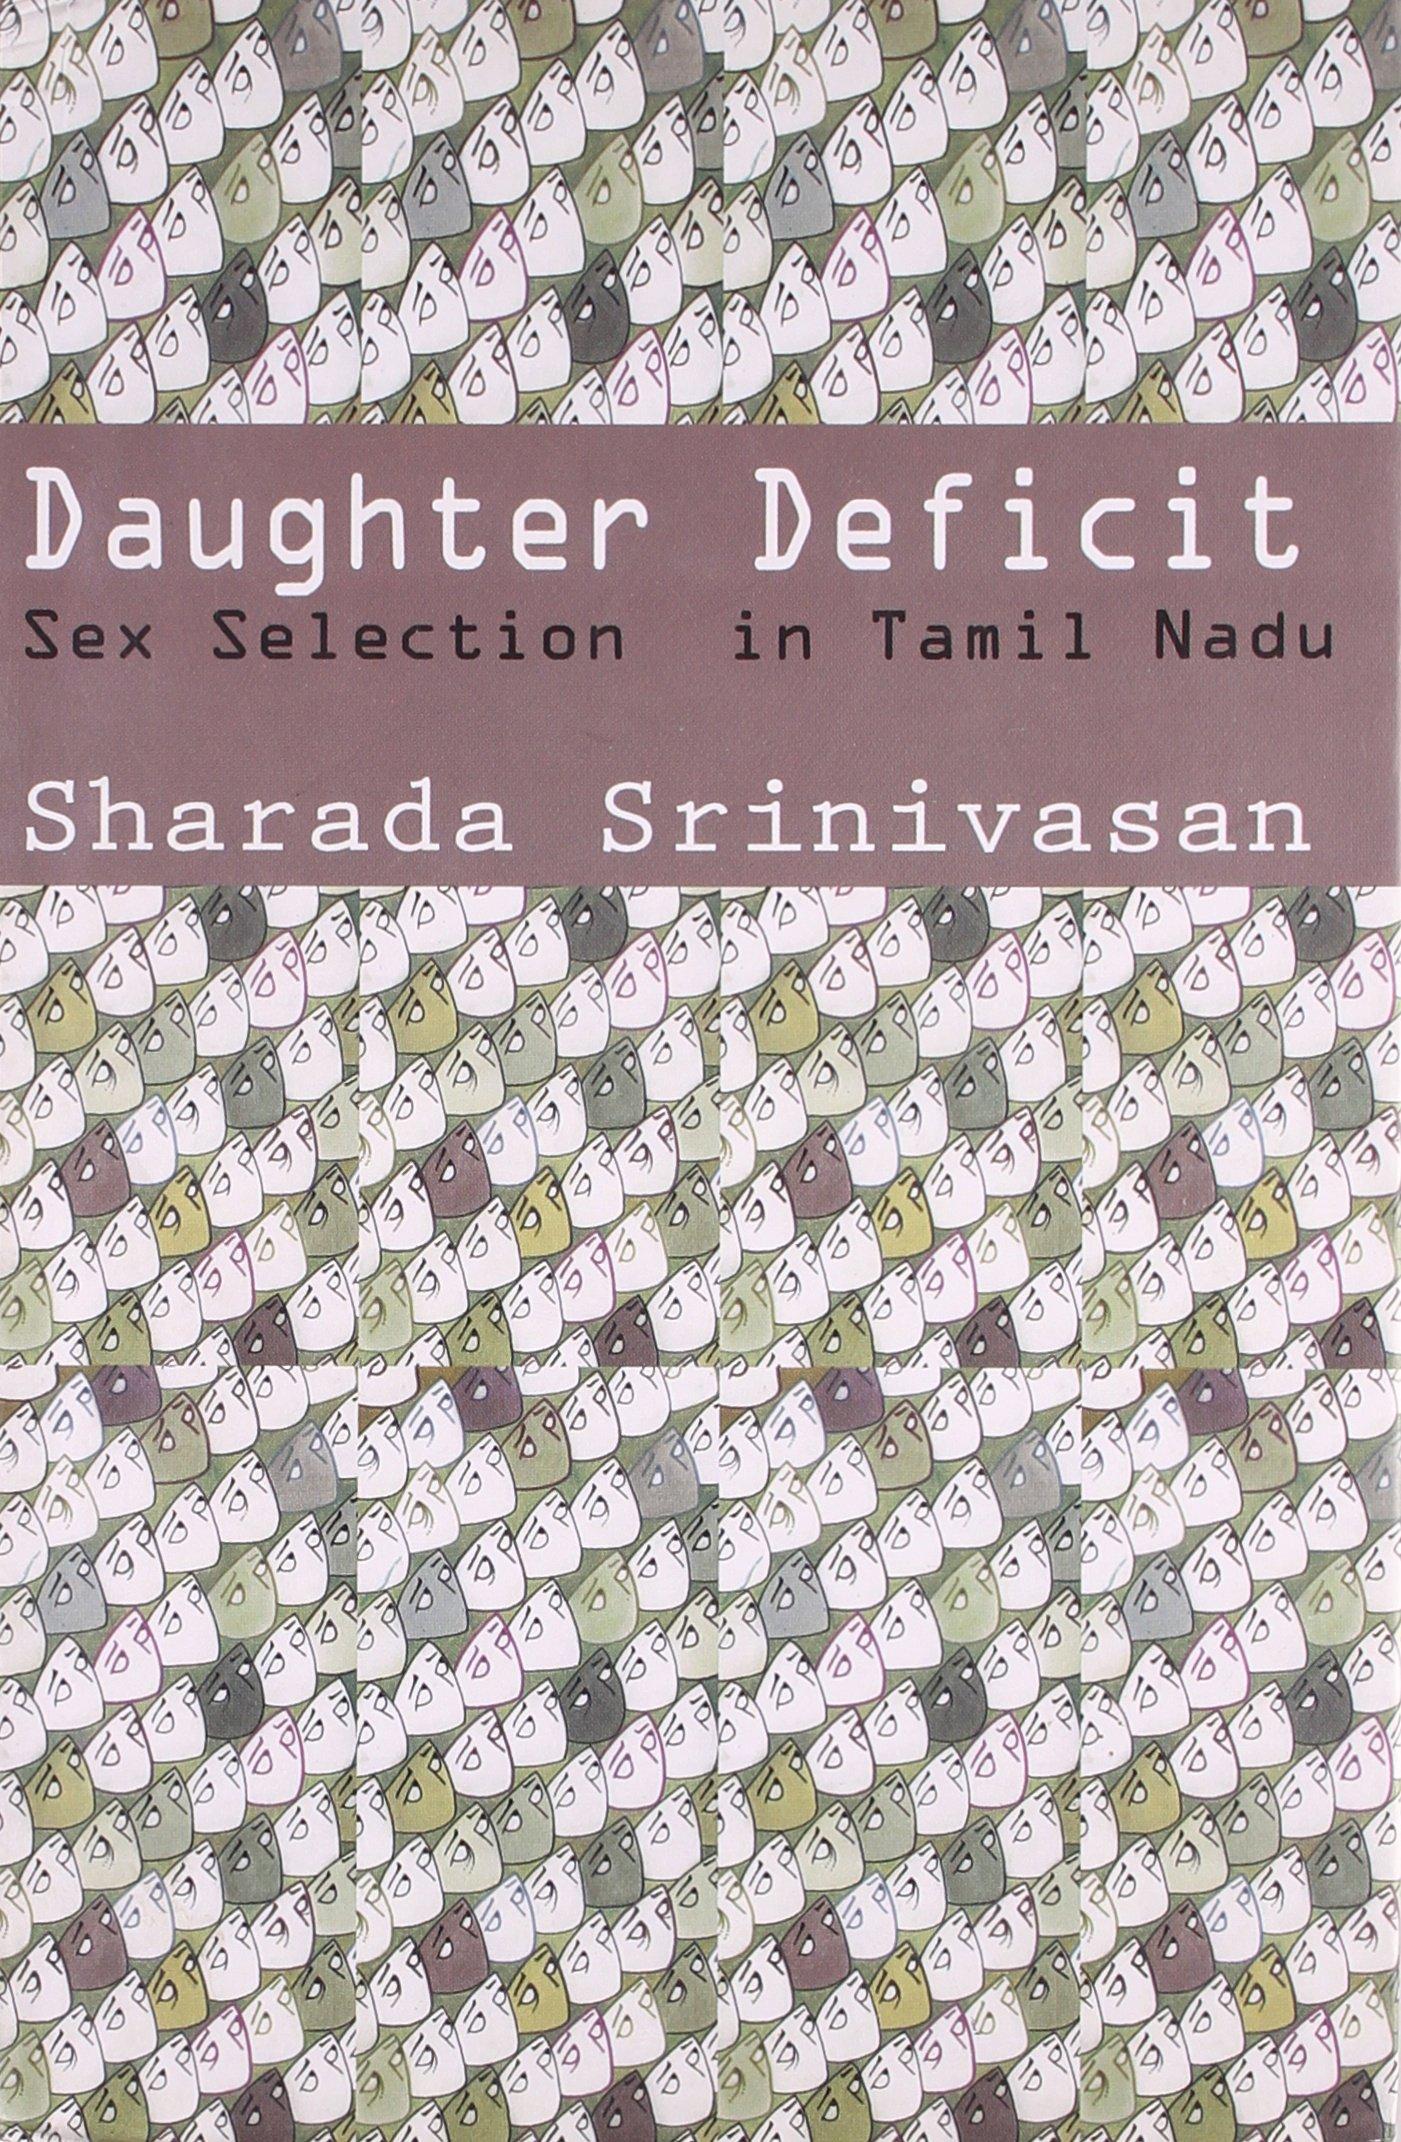 Buy Daughter Deficit Selection in Tamil Nadu Book line at Low